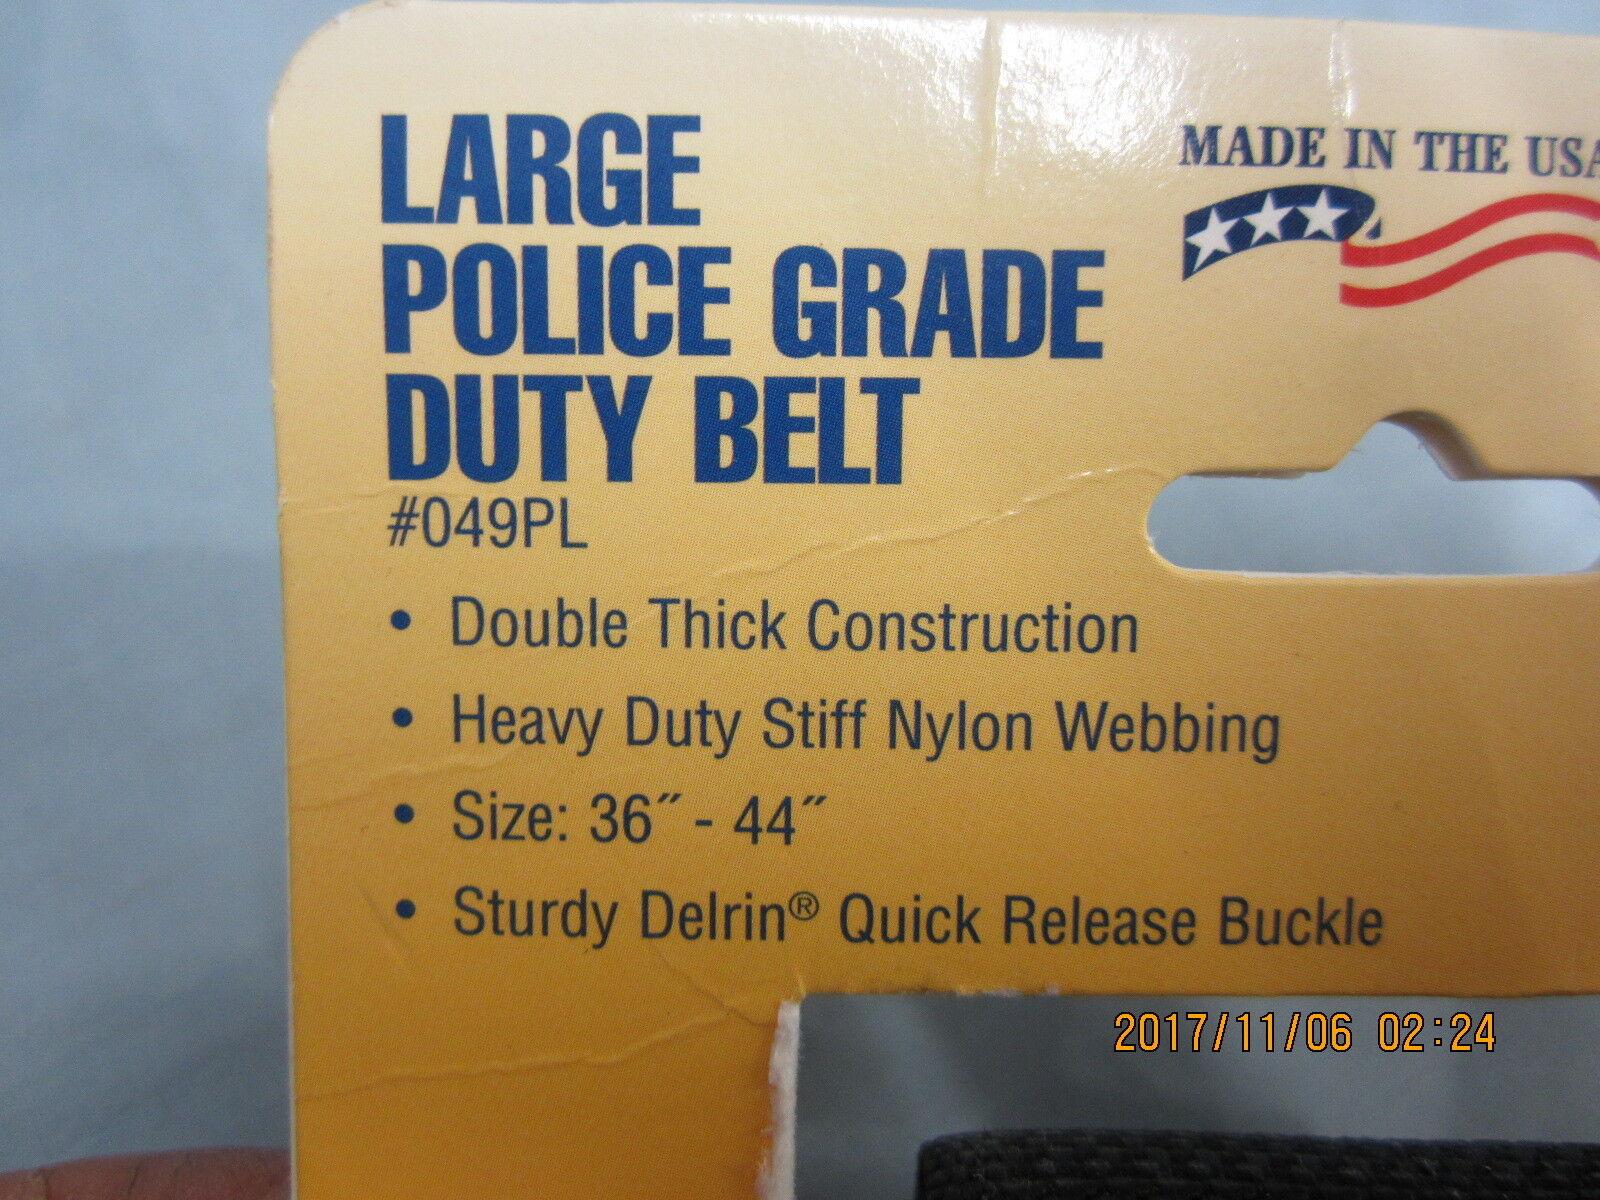 "New Raine Police Grade Duty Belt 2"" New 049PL 36-44"" New"